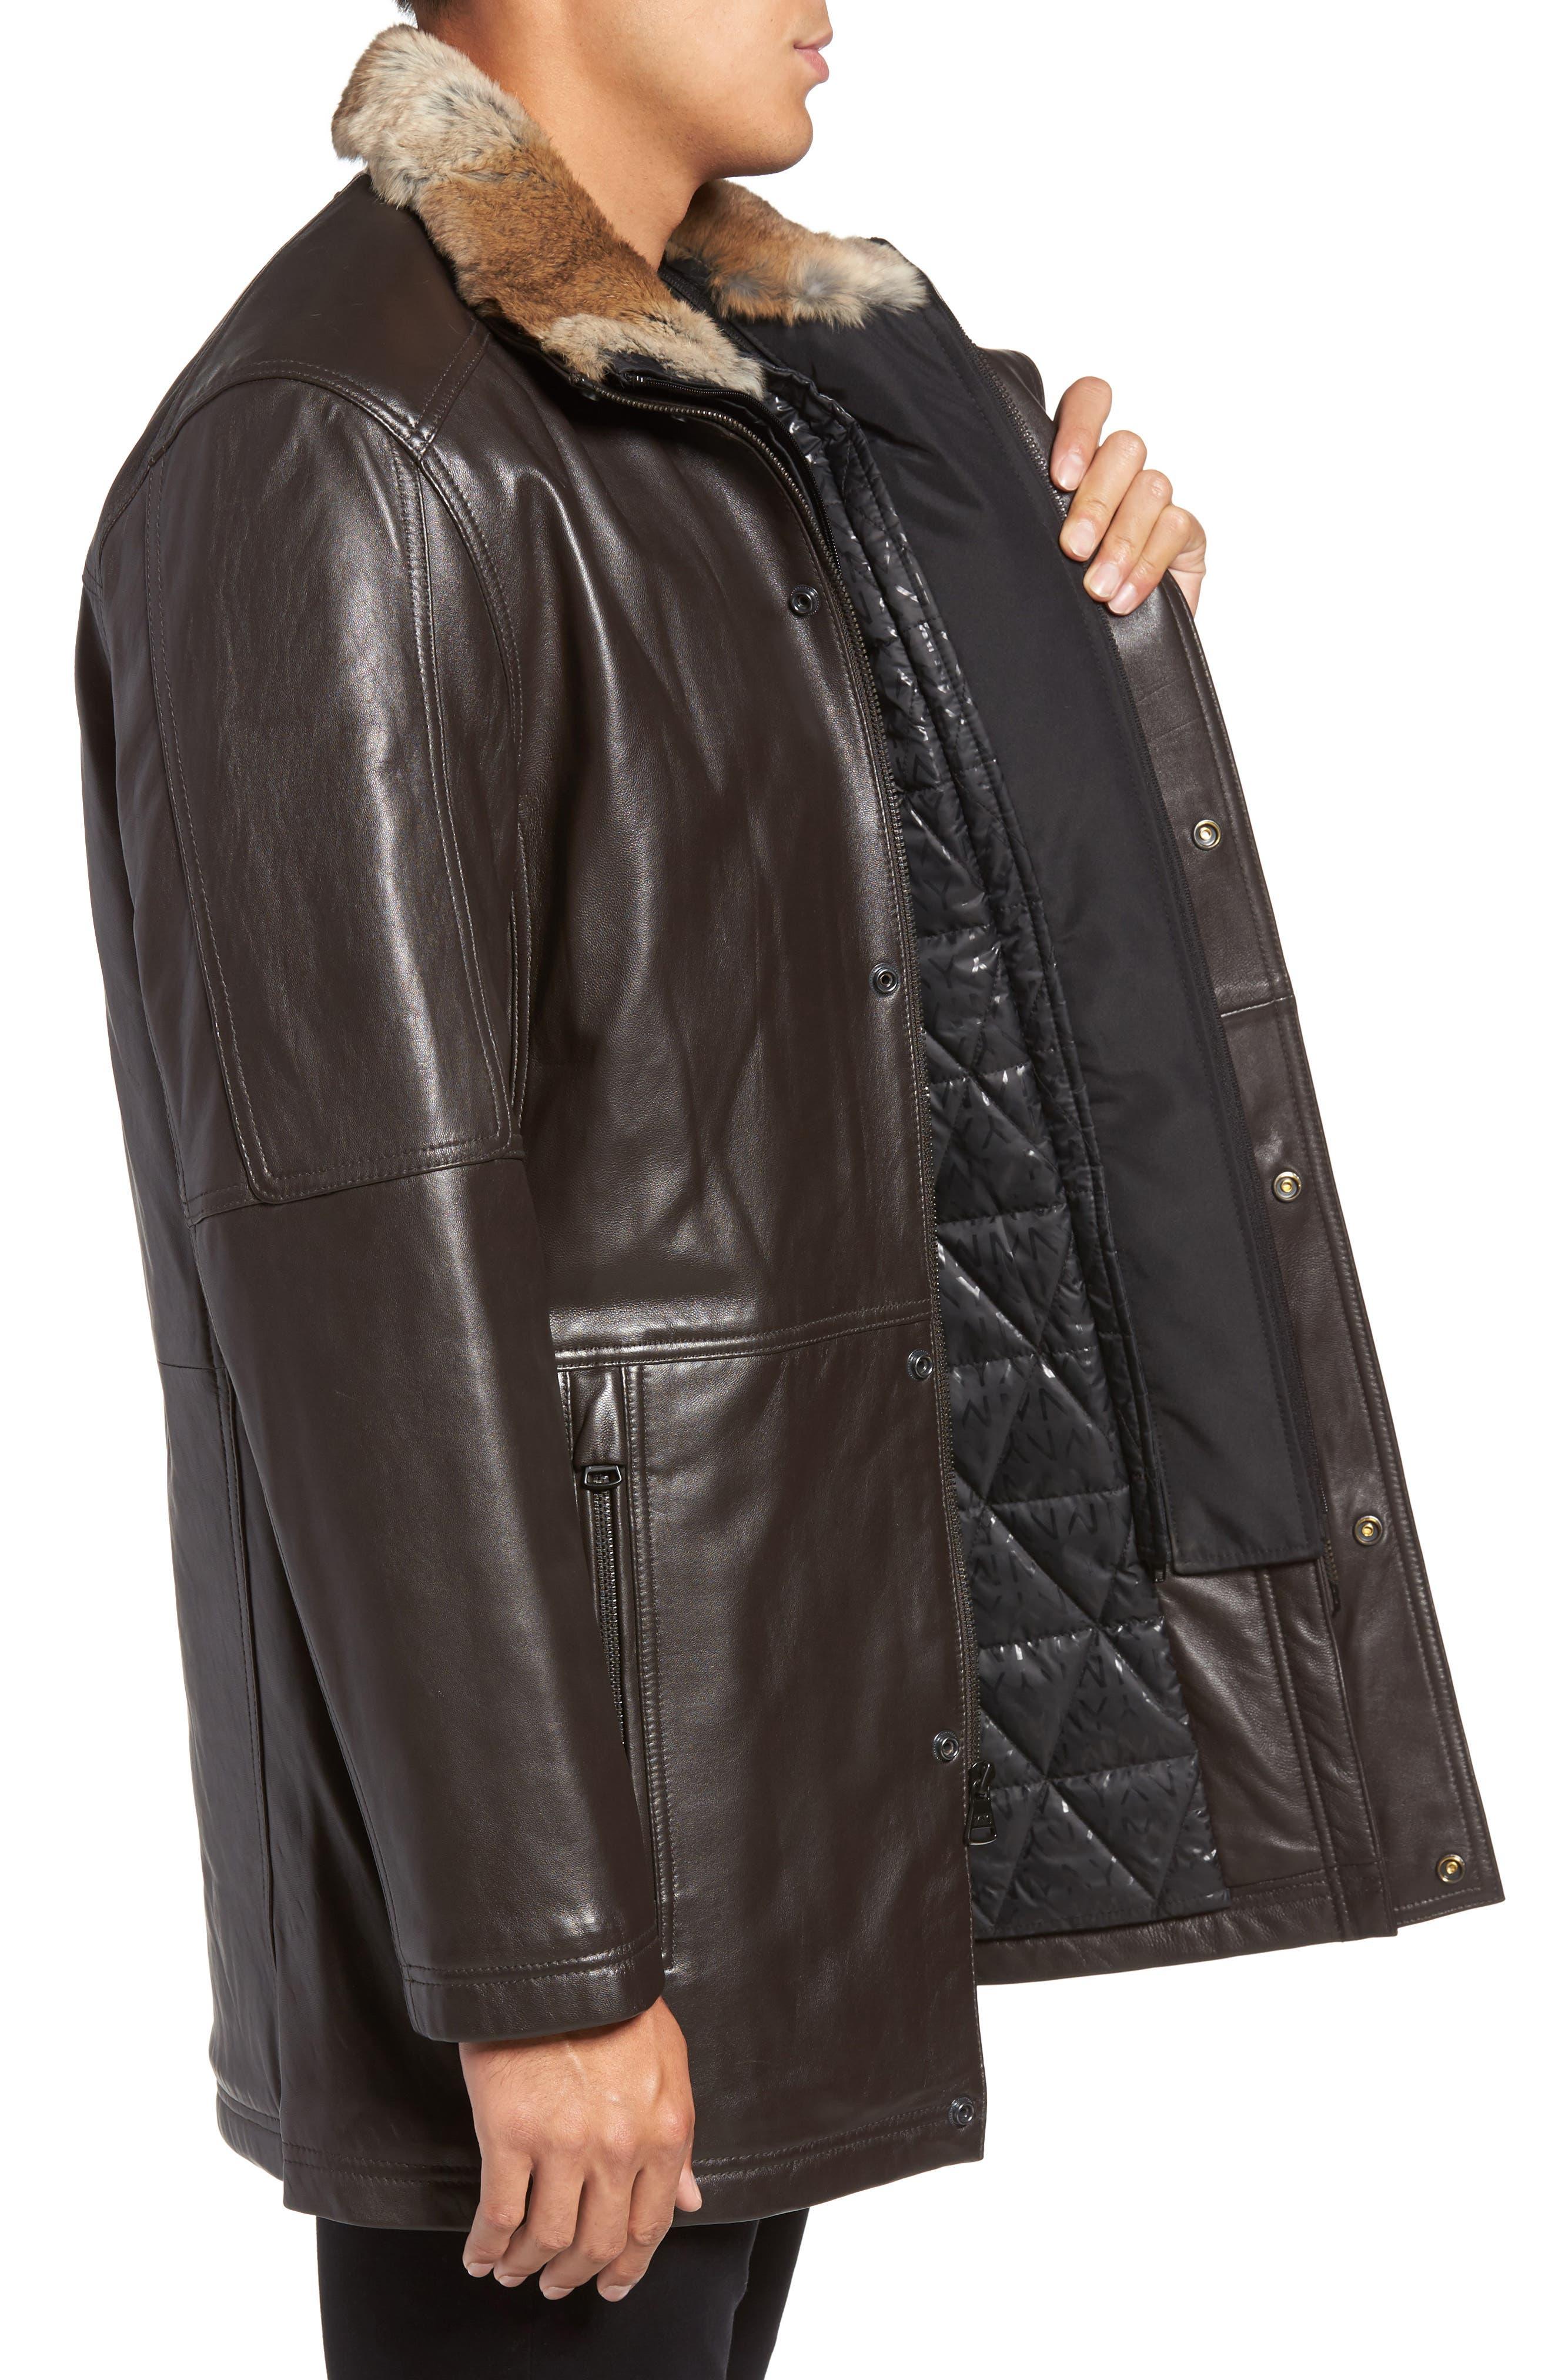 Middlebury Leather Car Coat with Genuine Rabbit Fur Trim,                             Alternate thumbnail 3, color,                             Espresso